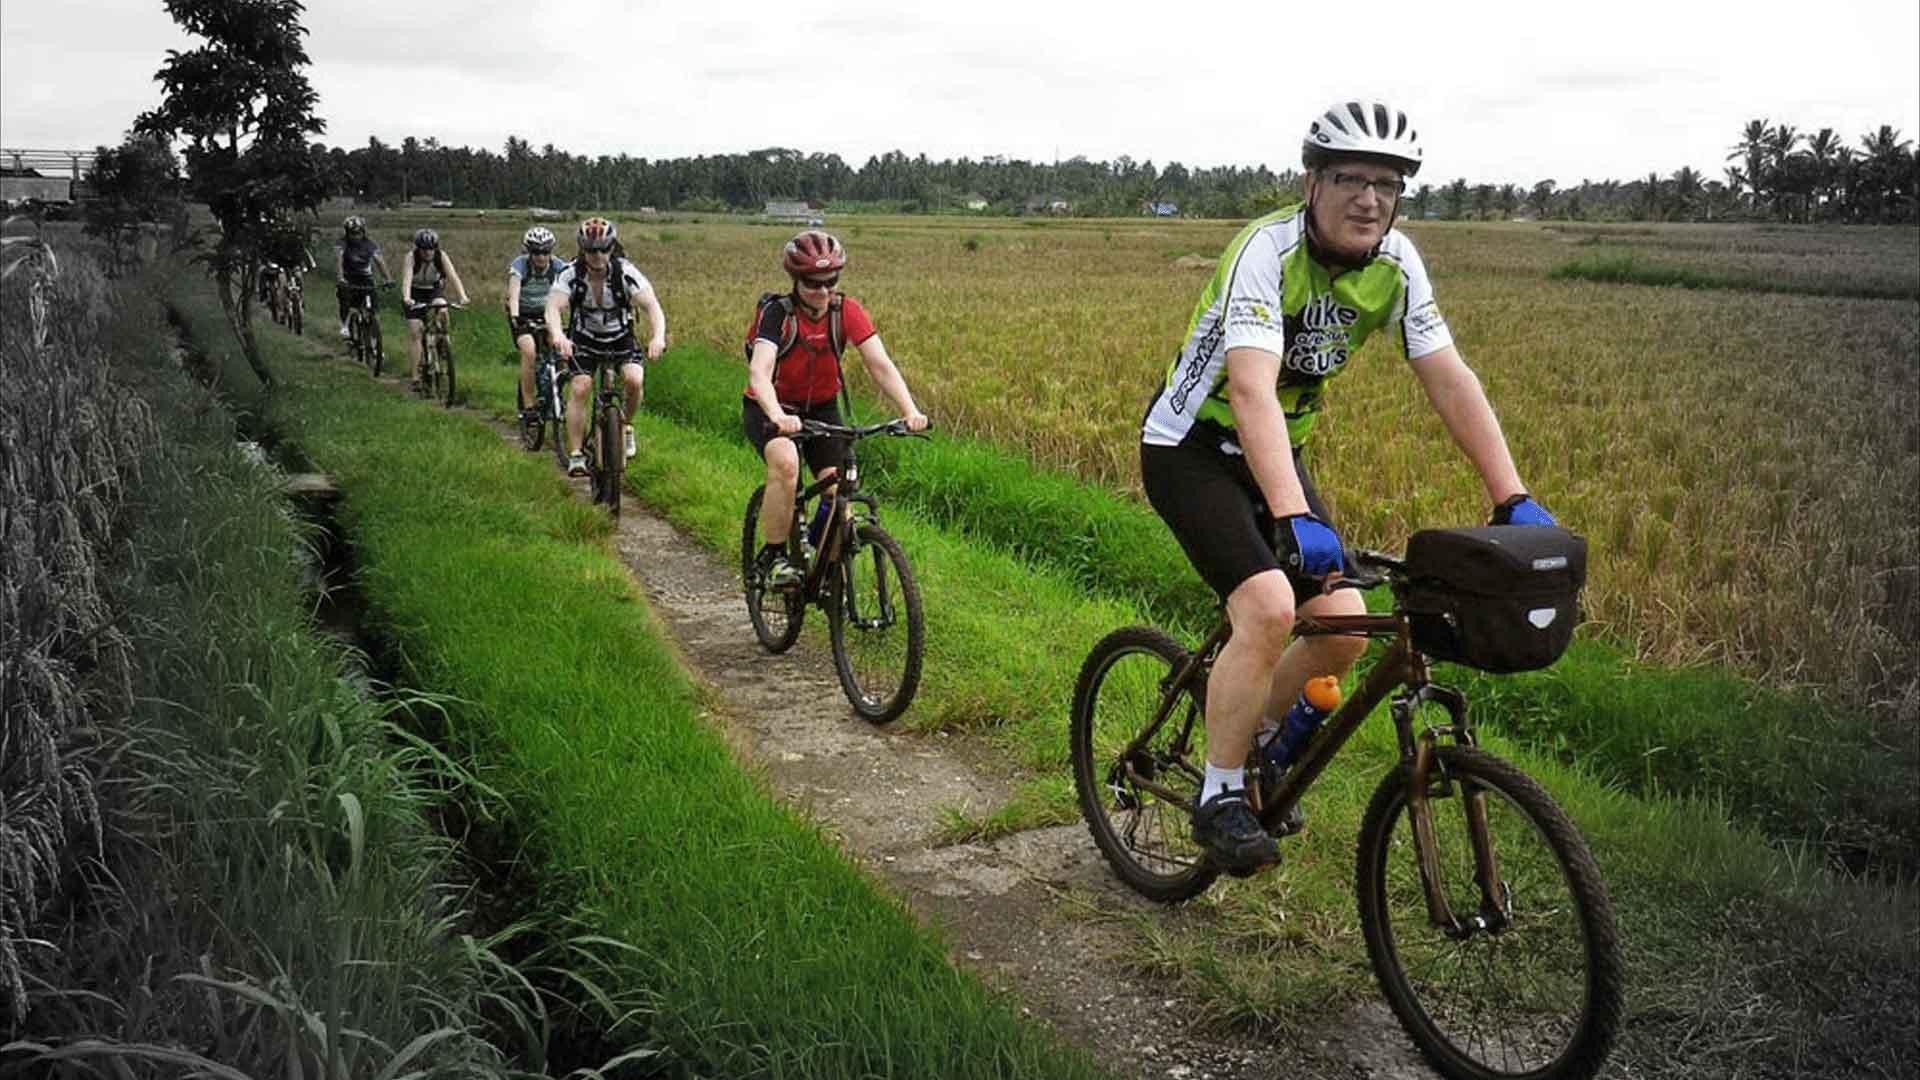 Bali-Cycling-Dirt-Bike-Adventures